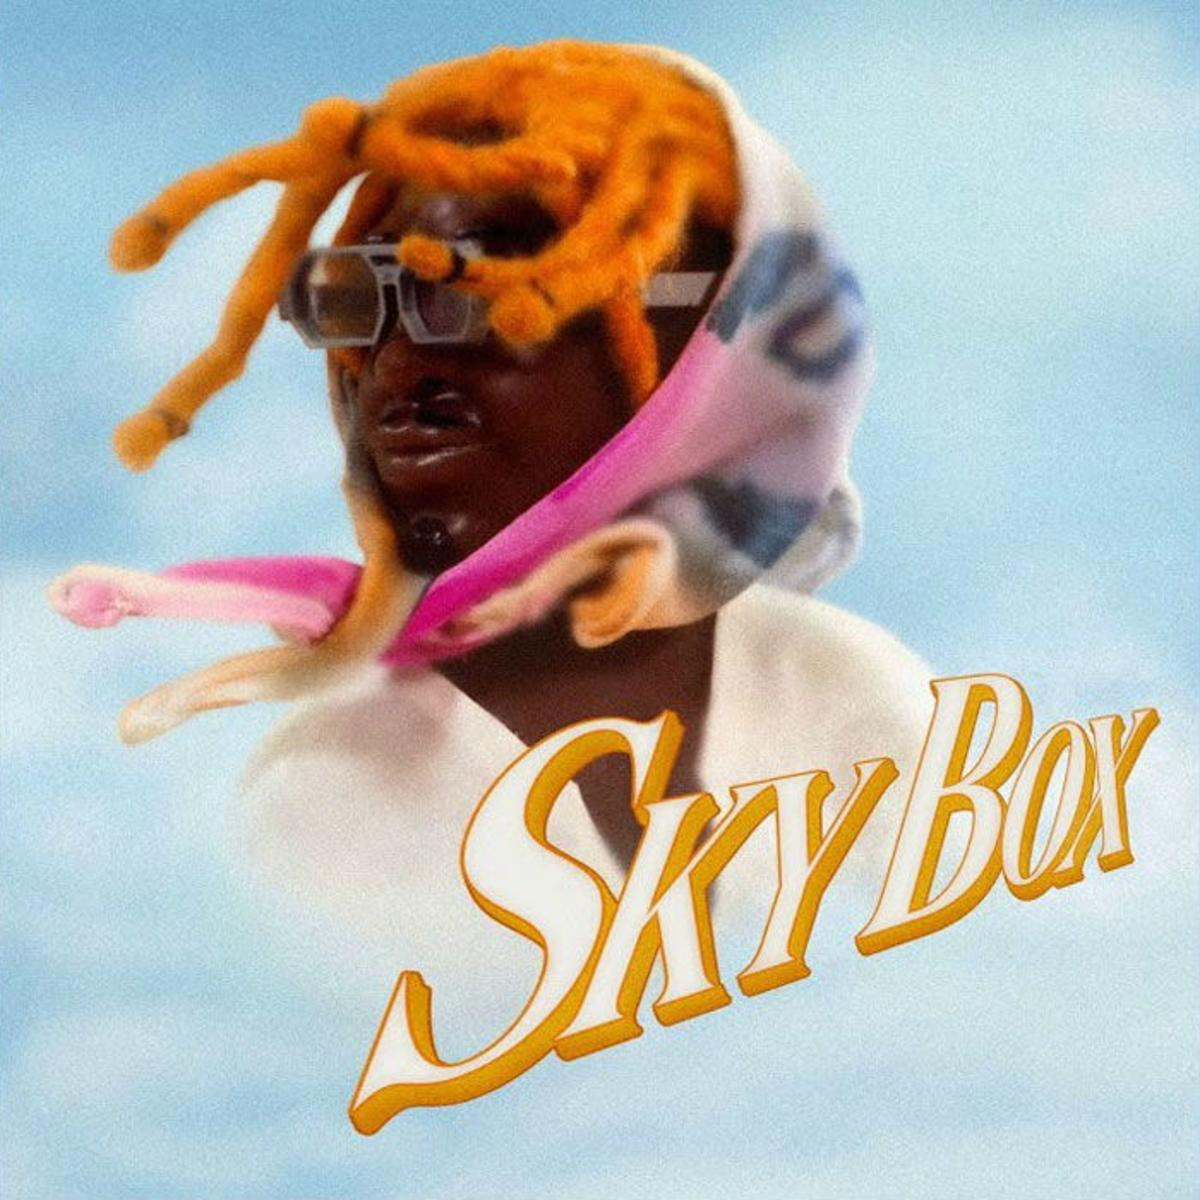 Gunna - Skybox